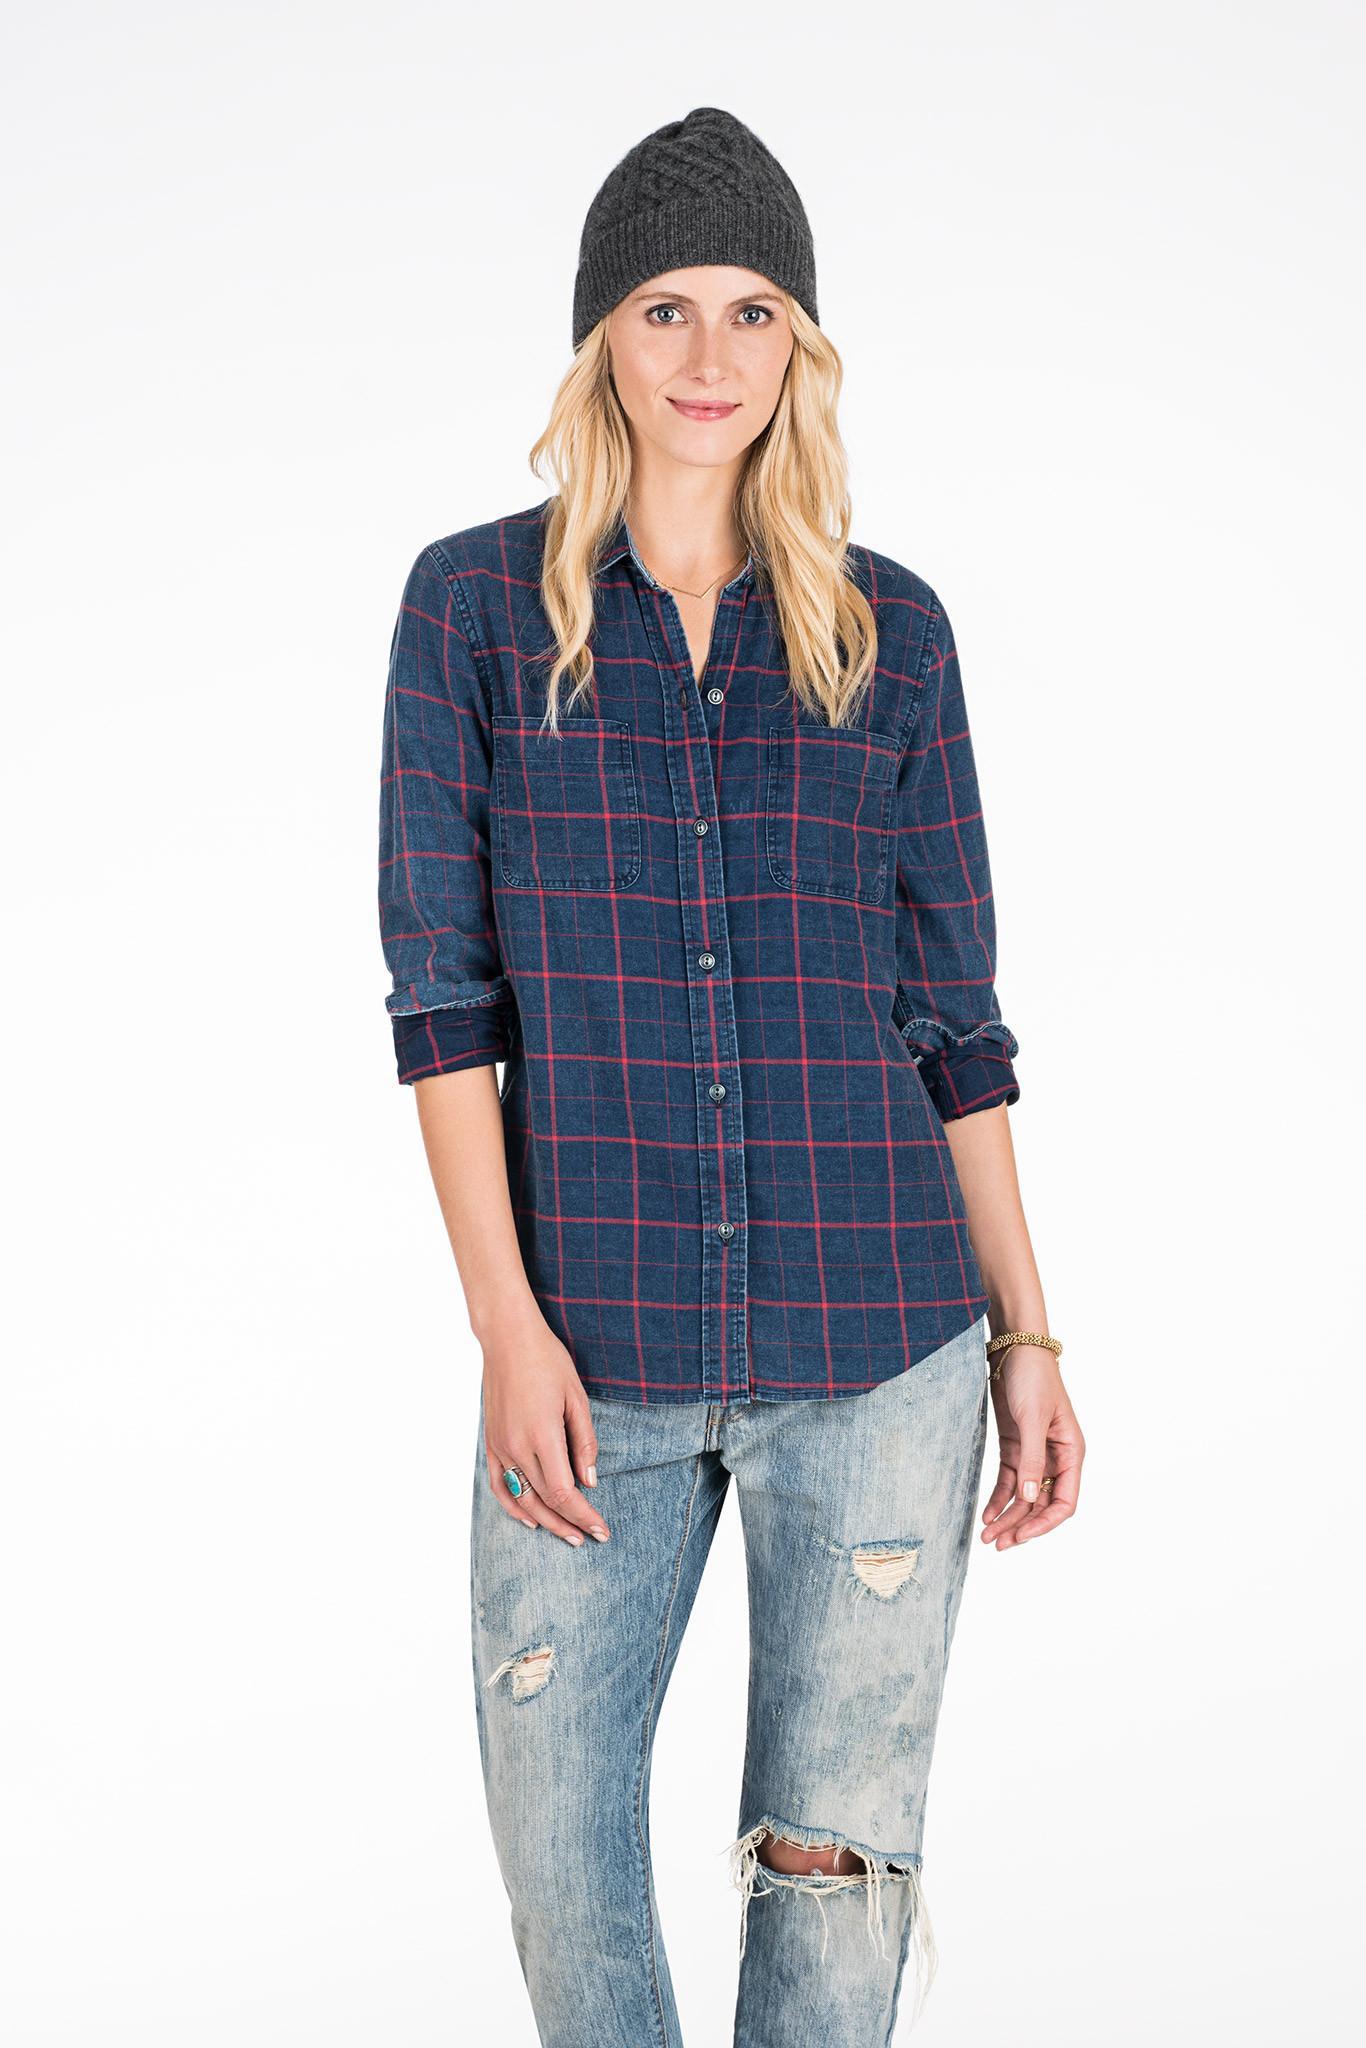 Faherty Brand Malibu Shirt in Blue